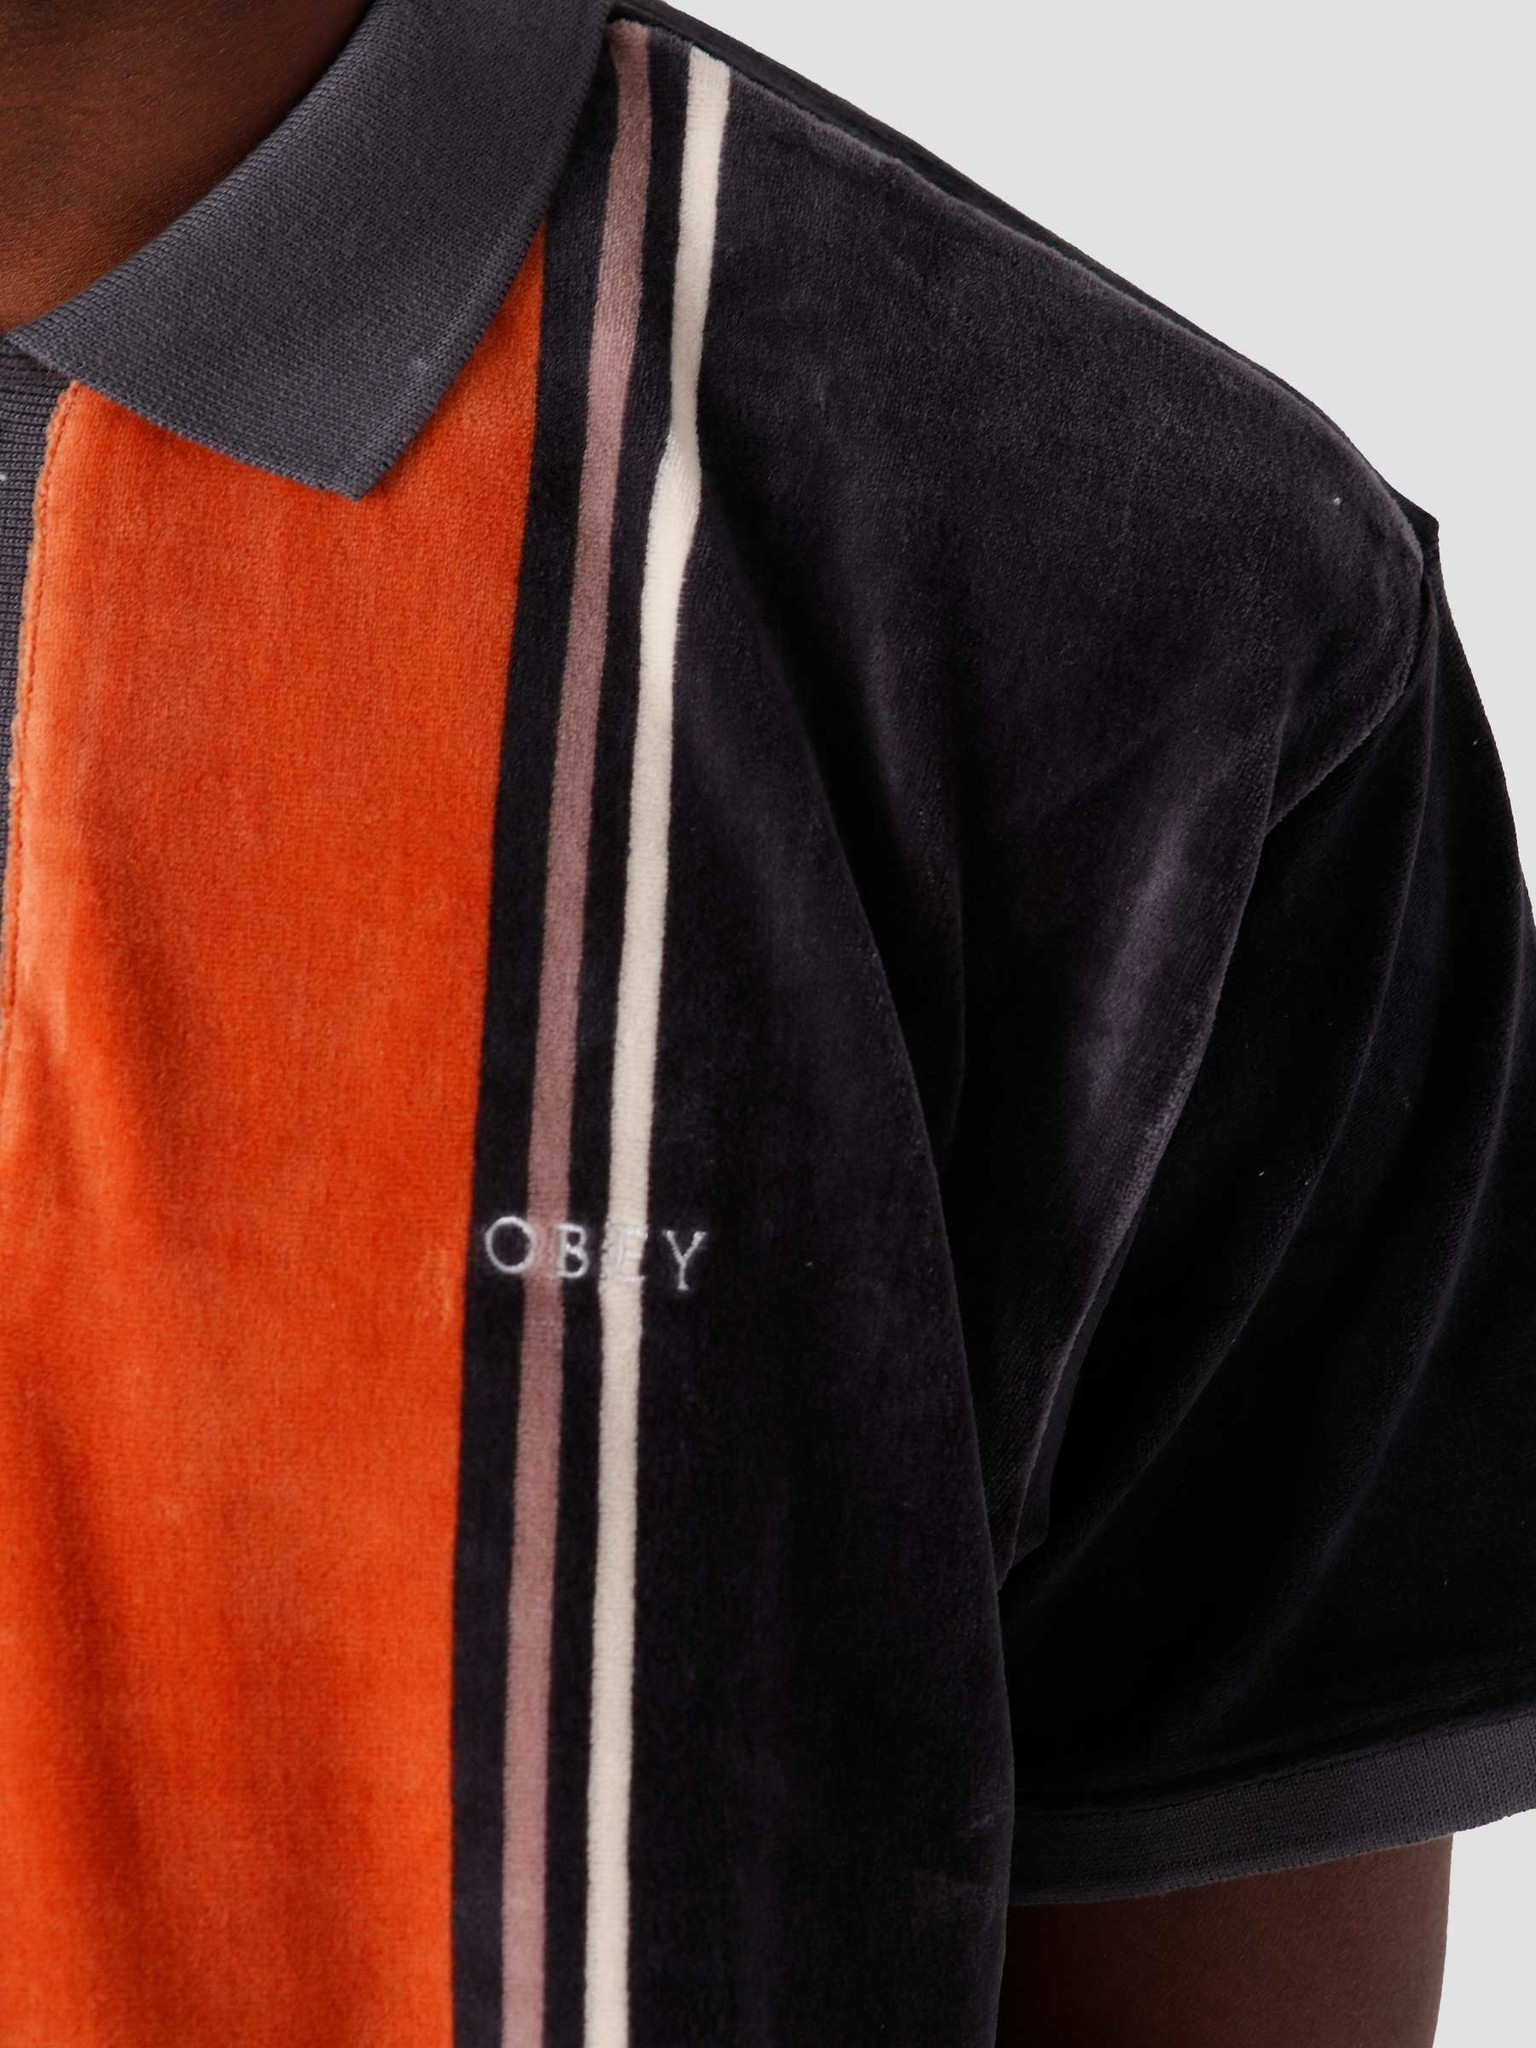 Obey Obey Jenkin Polo Full Indigo Multi 131090063-IDM